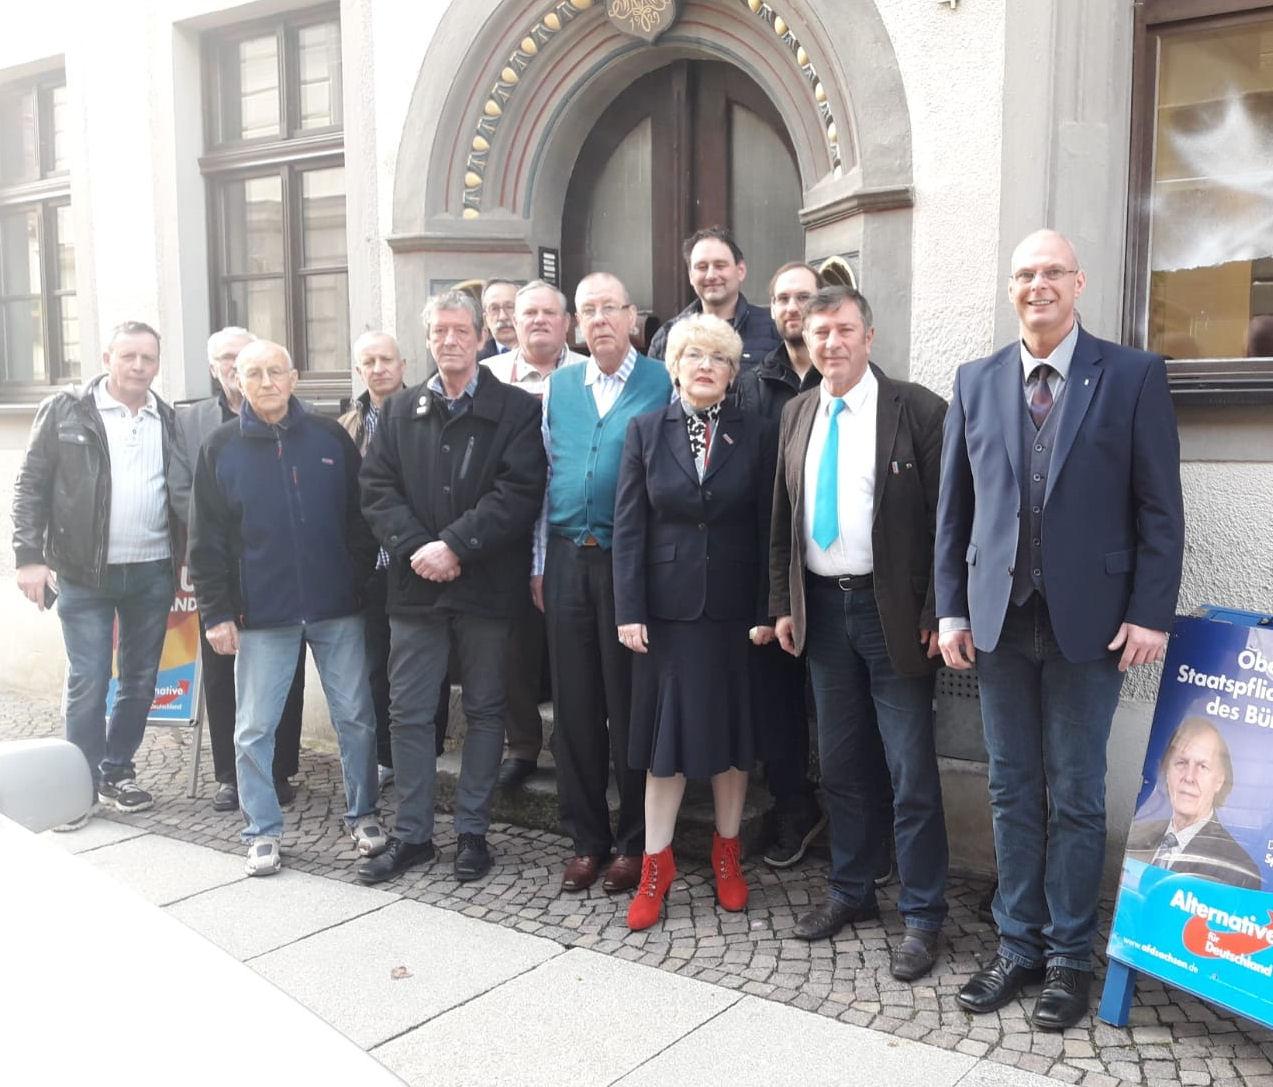 Bürgerbüro in Torgau erfolgreich eröffnet